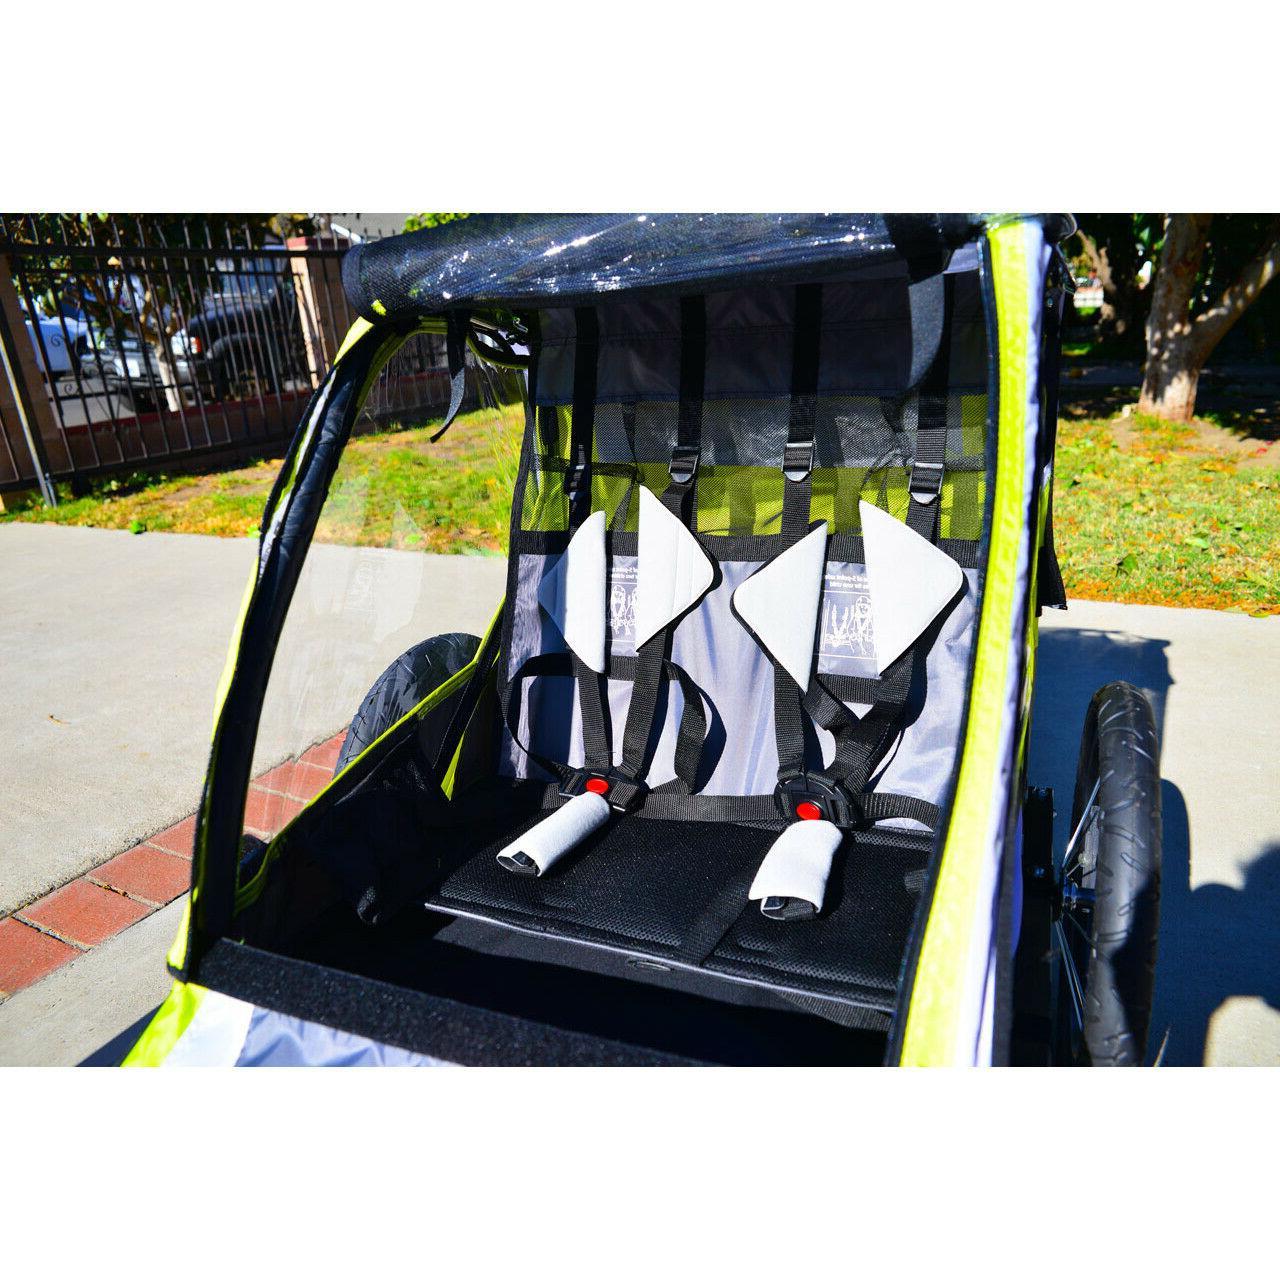 Green Bike Trailer Stroller Racing Sports